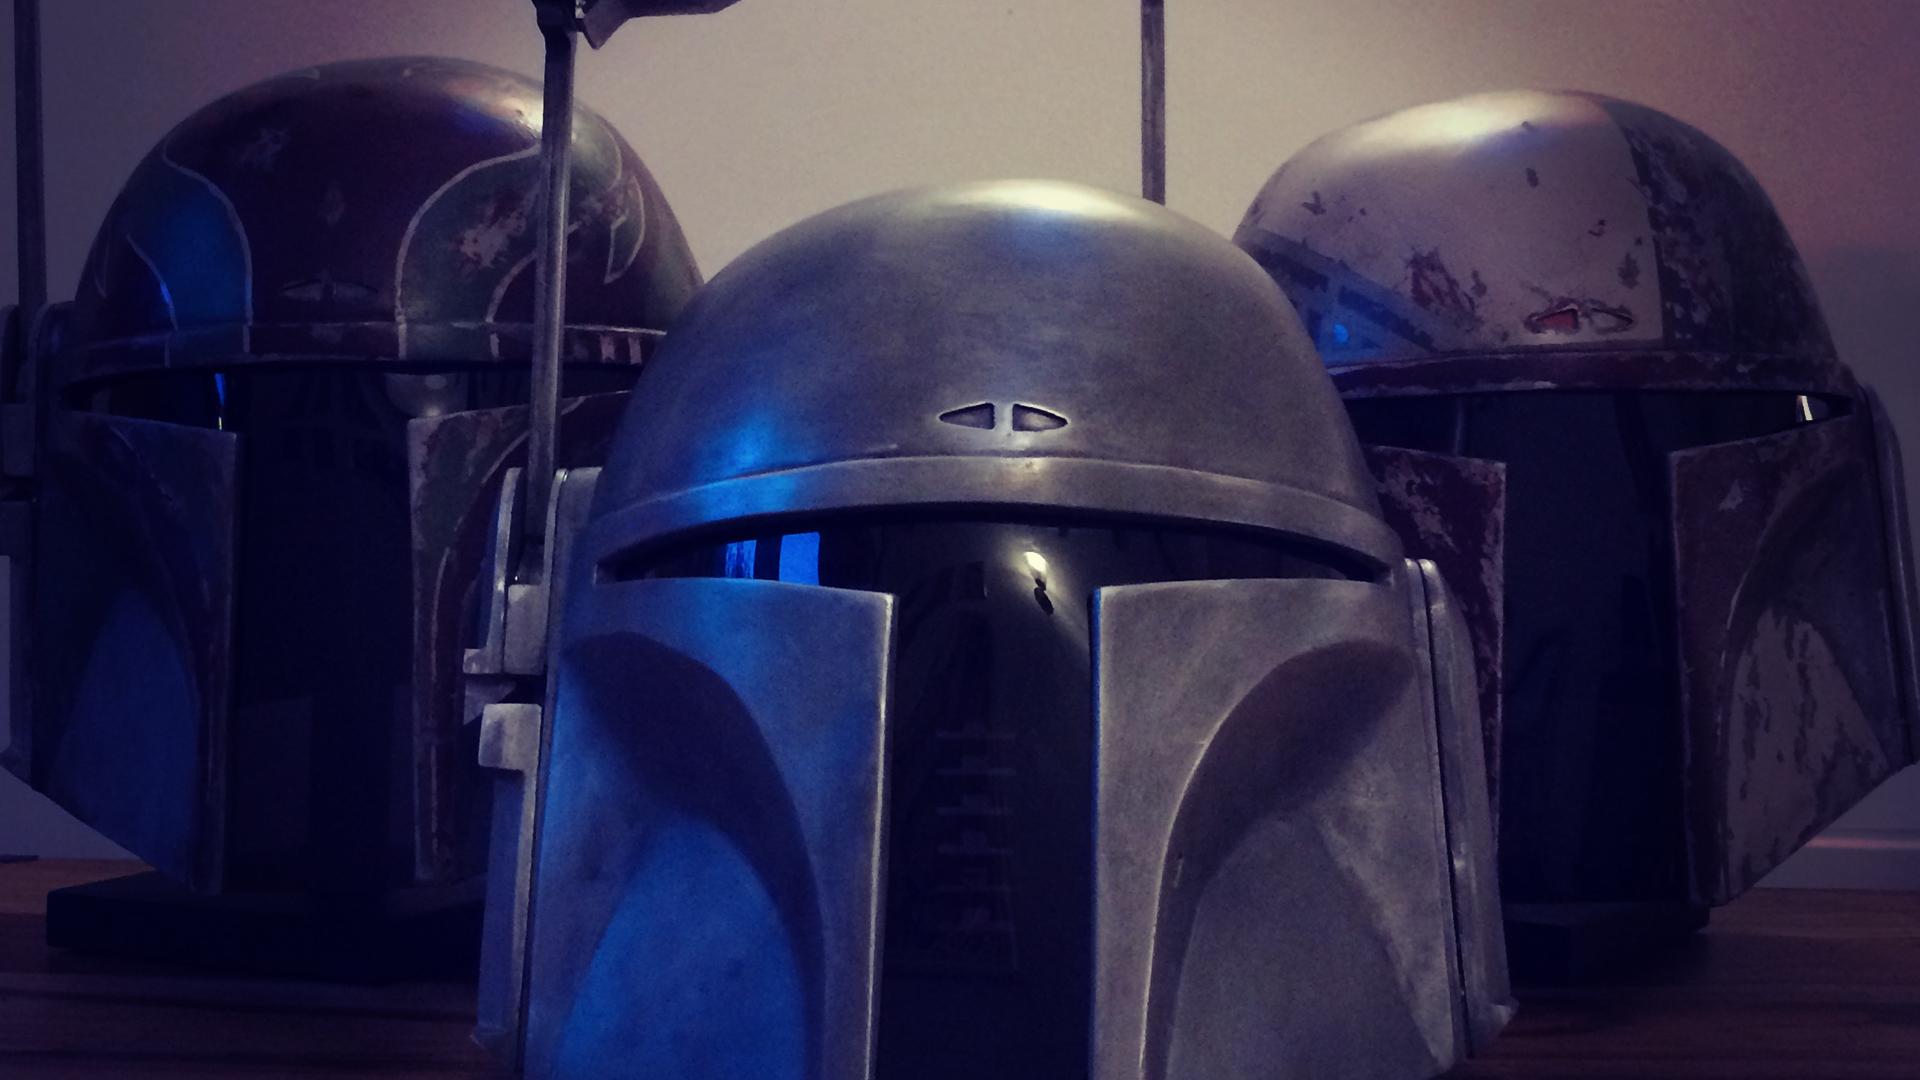 Permalink to: Mandalorian Helmet Kits